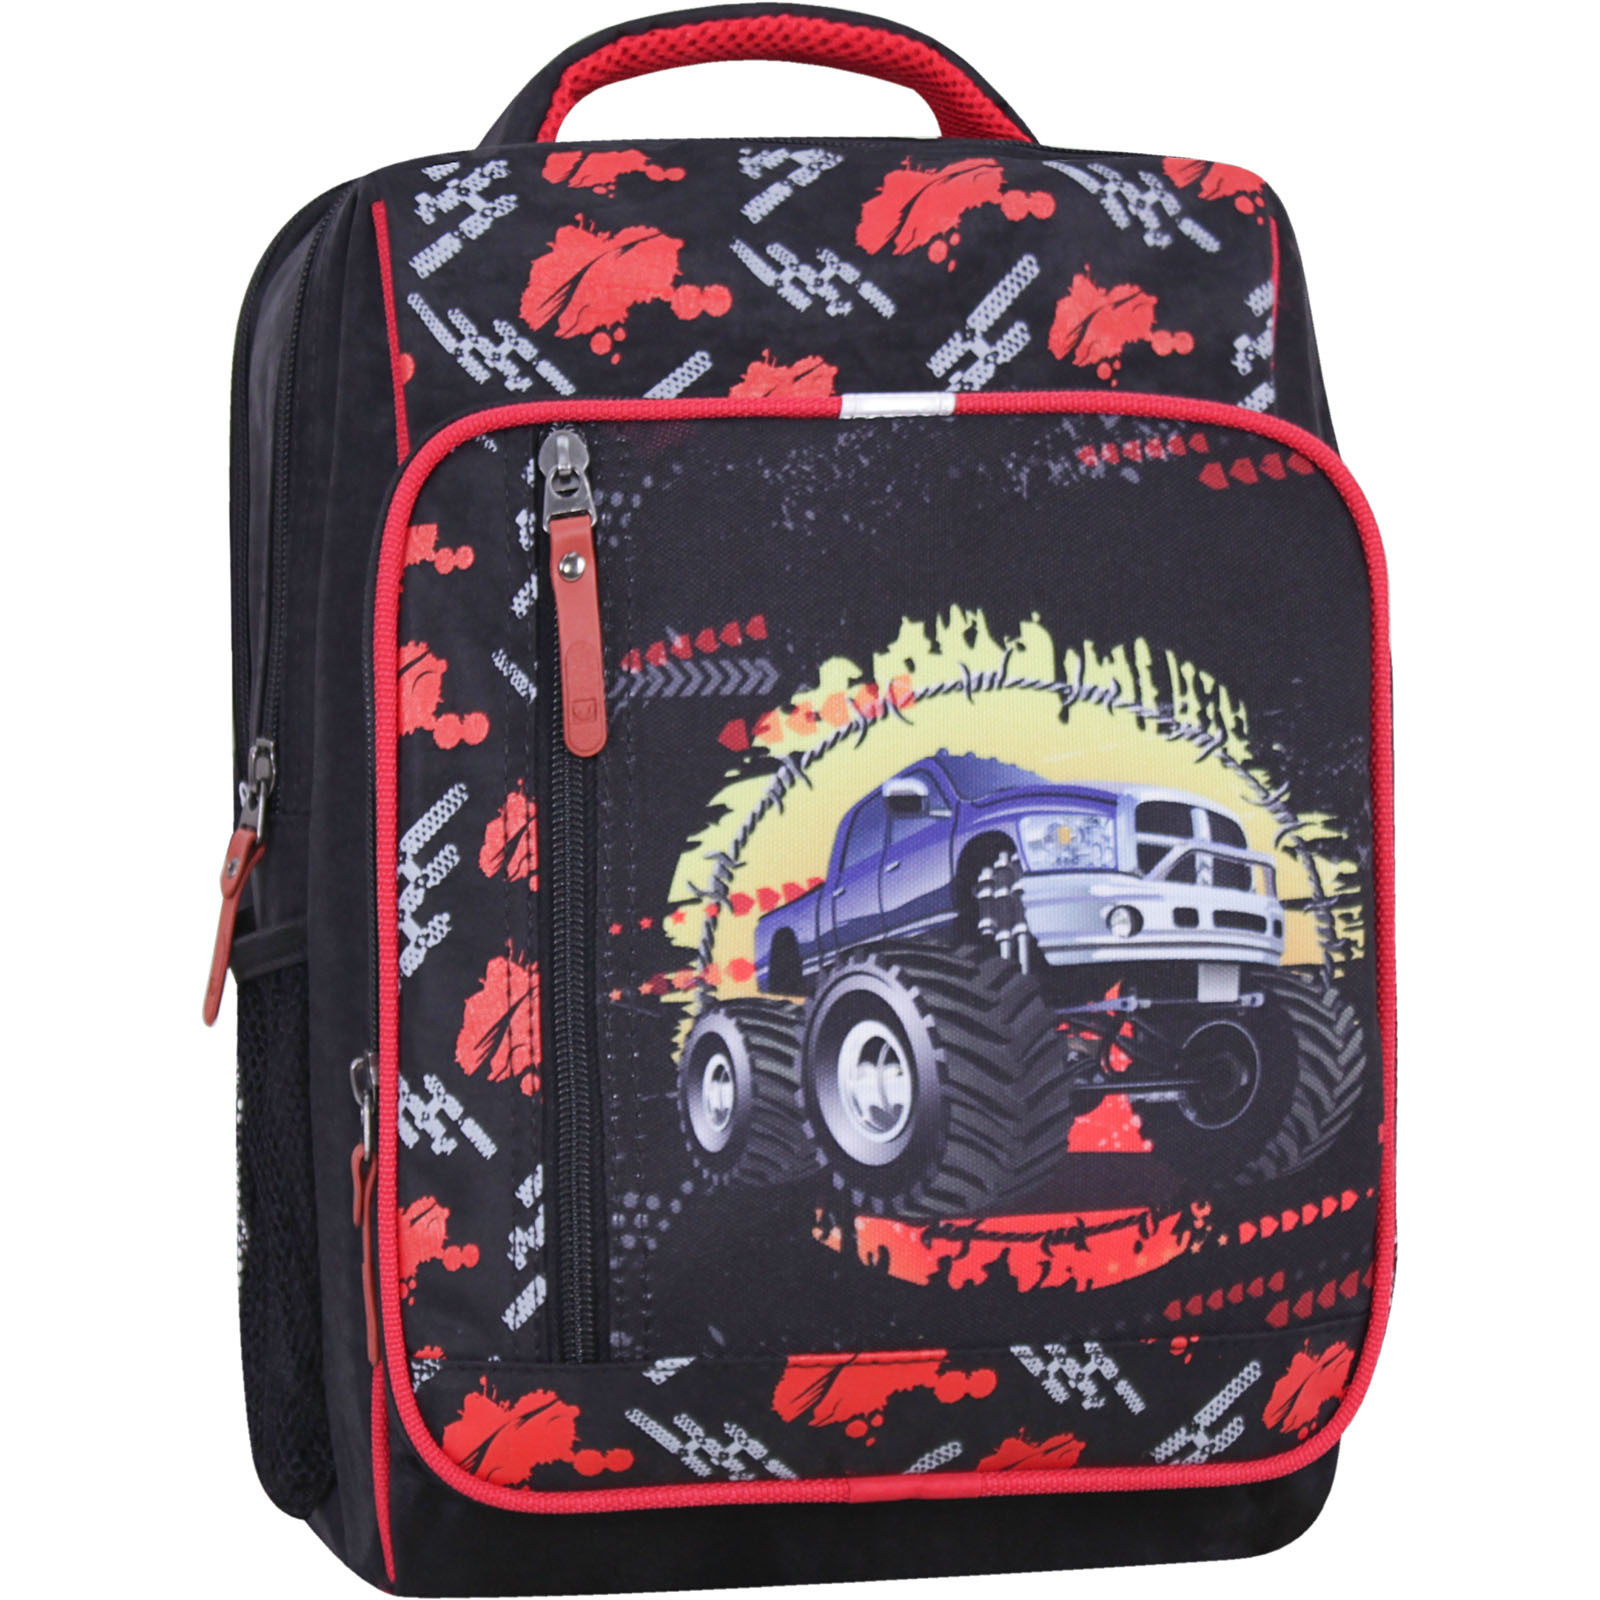 Школьные рюкзаки Рюкзак школьный Bagland Школьник 8 л. черный 660 (0012870) IMG_2713_суб.660_-1600.jpg